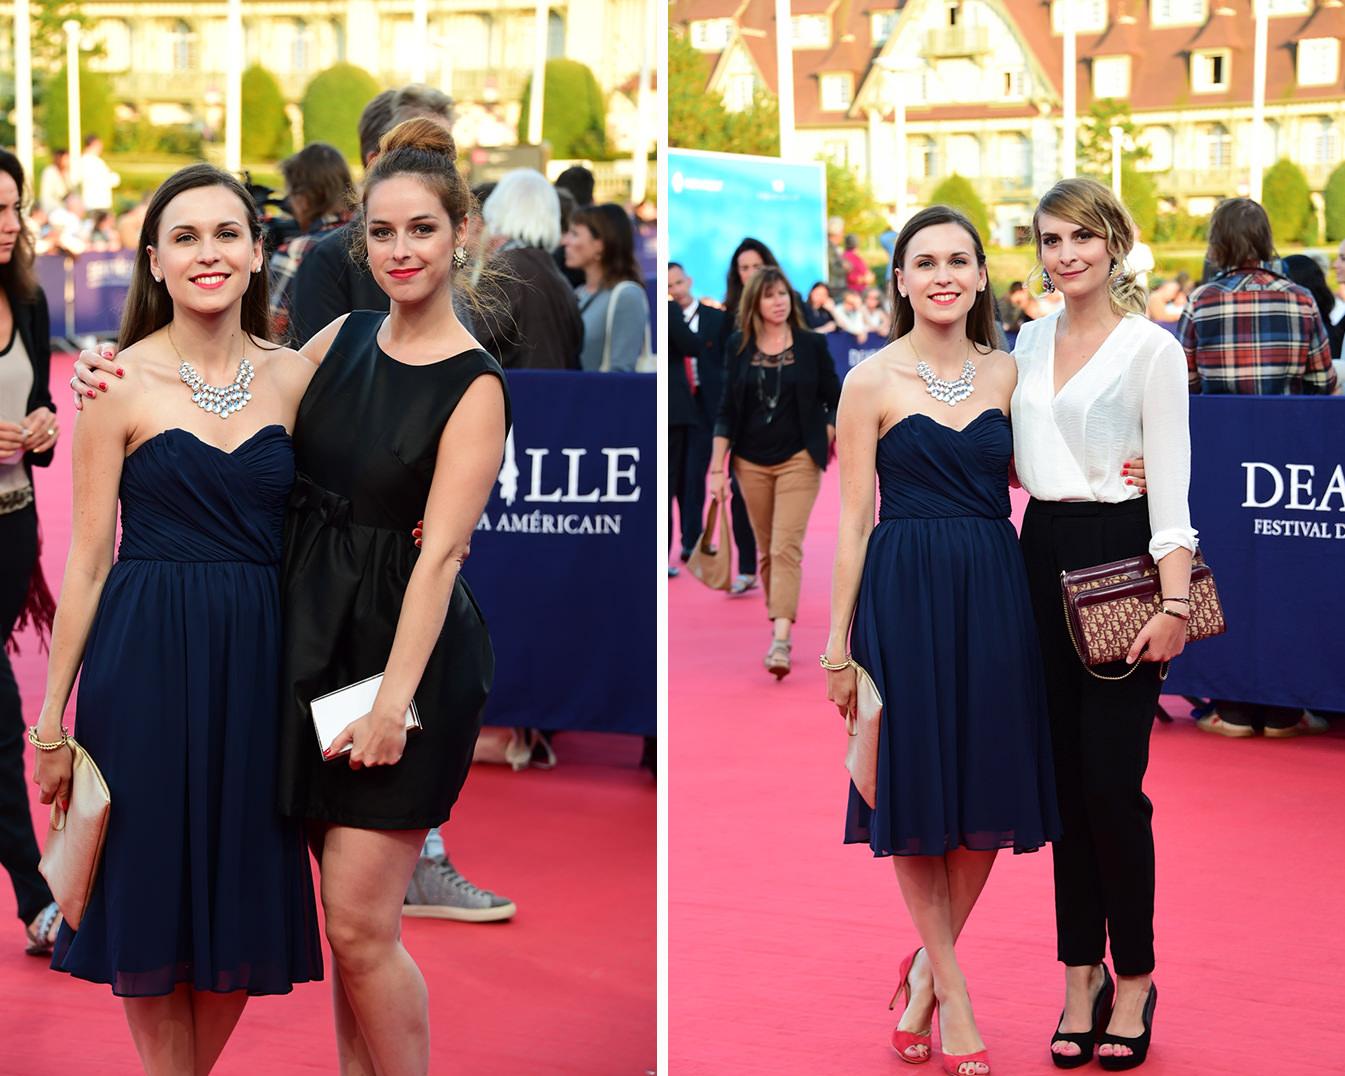 Blog-Mode-And-The-City-Lifestyle-Festival-Film-Américain-Deauville-Kiehl's